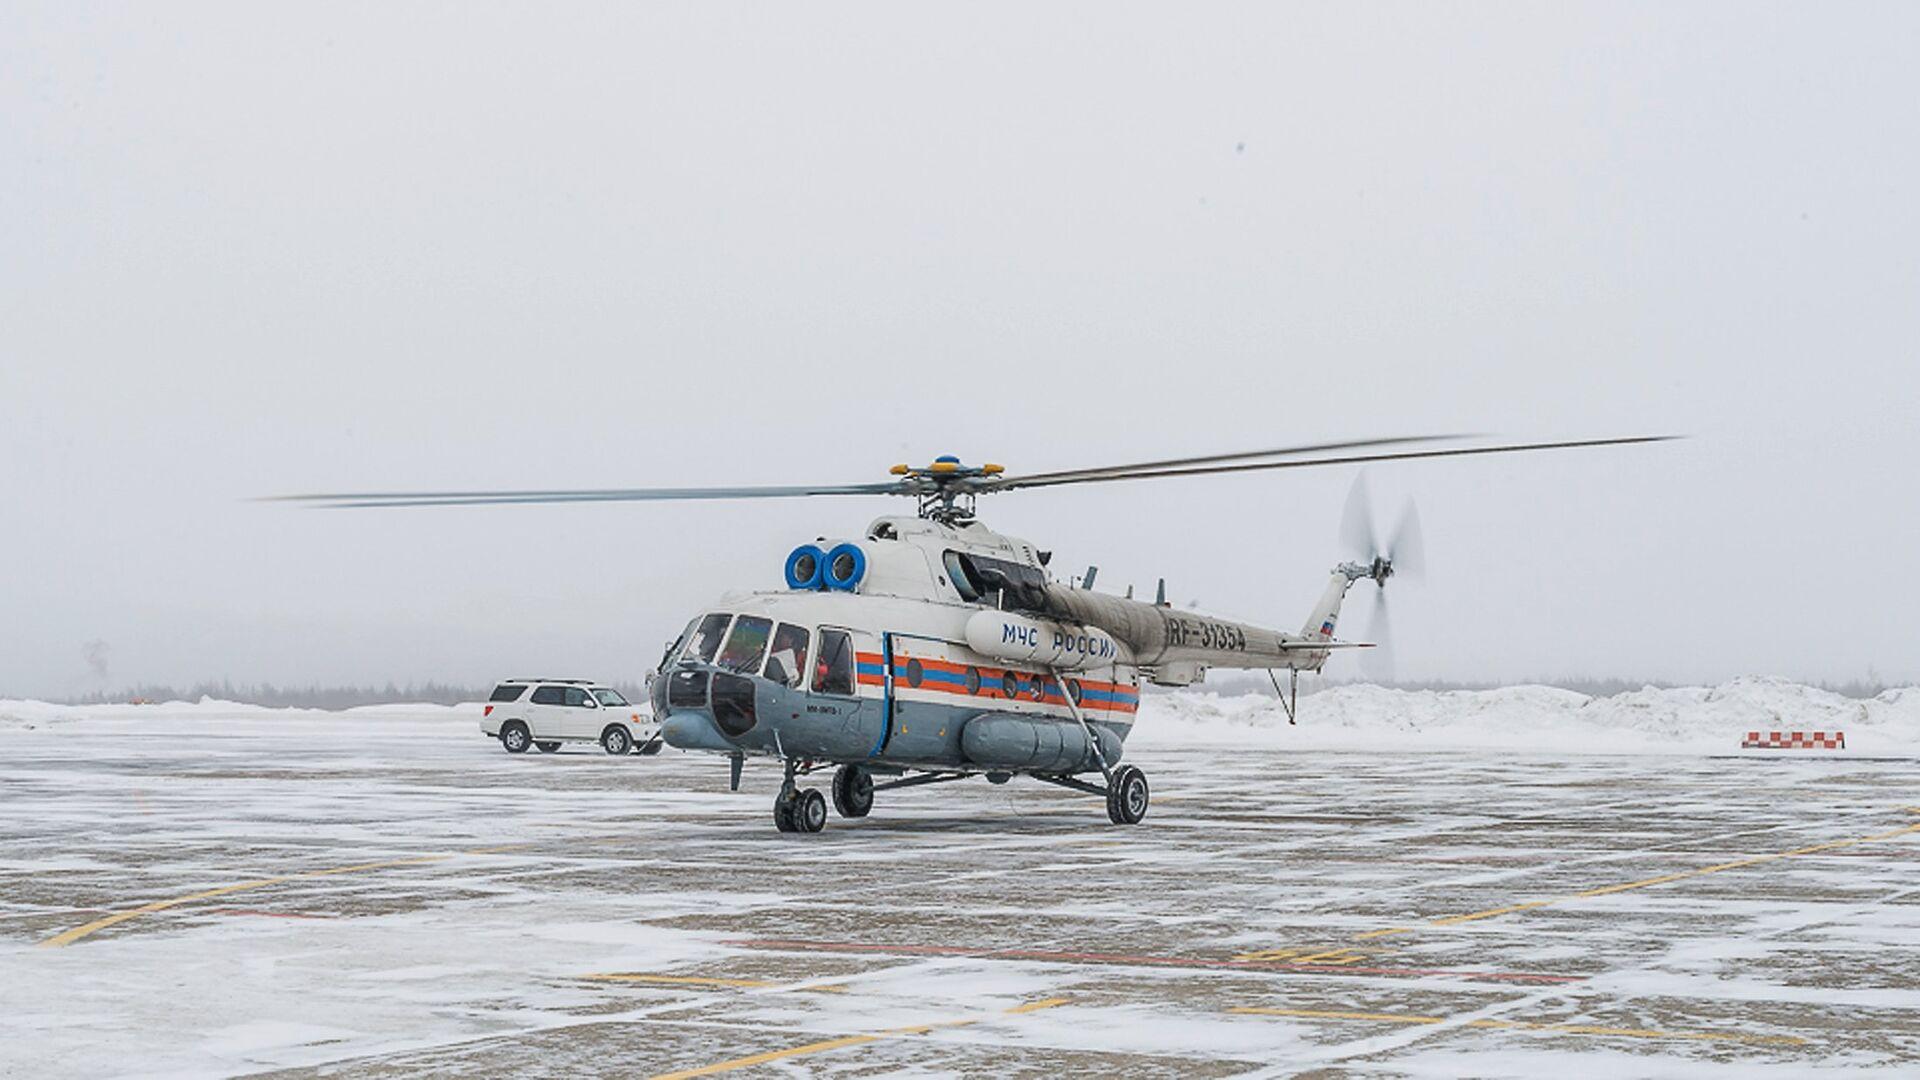 Вертолёт МИ-8 МЧС России в аэропорту Магадана - РИА Новости, 1920, 03.03.2021